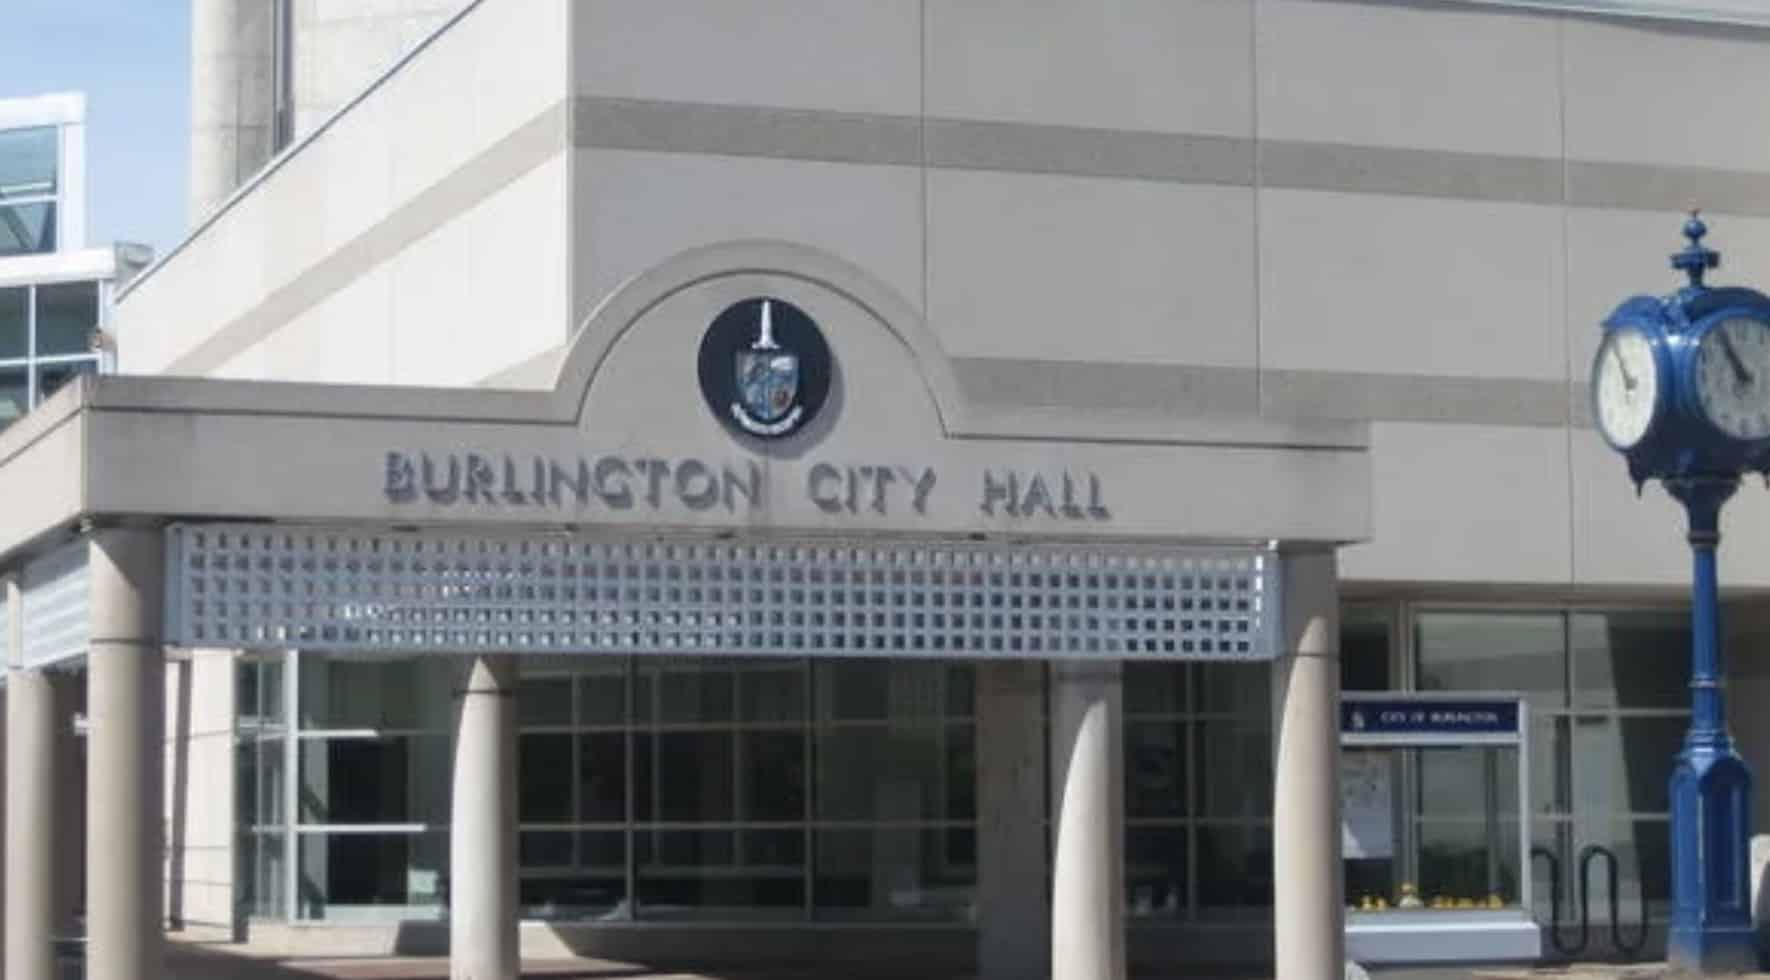 burlingtoncityhall